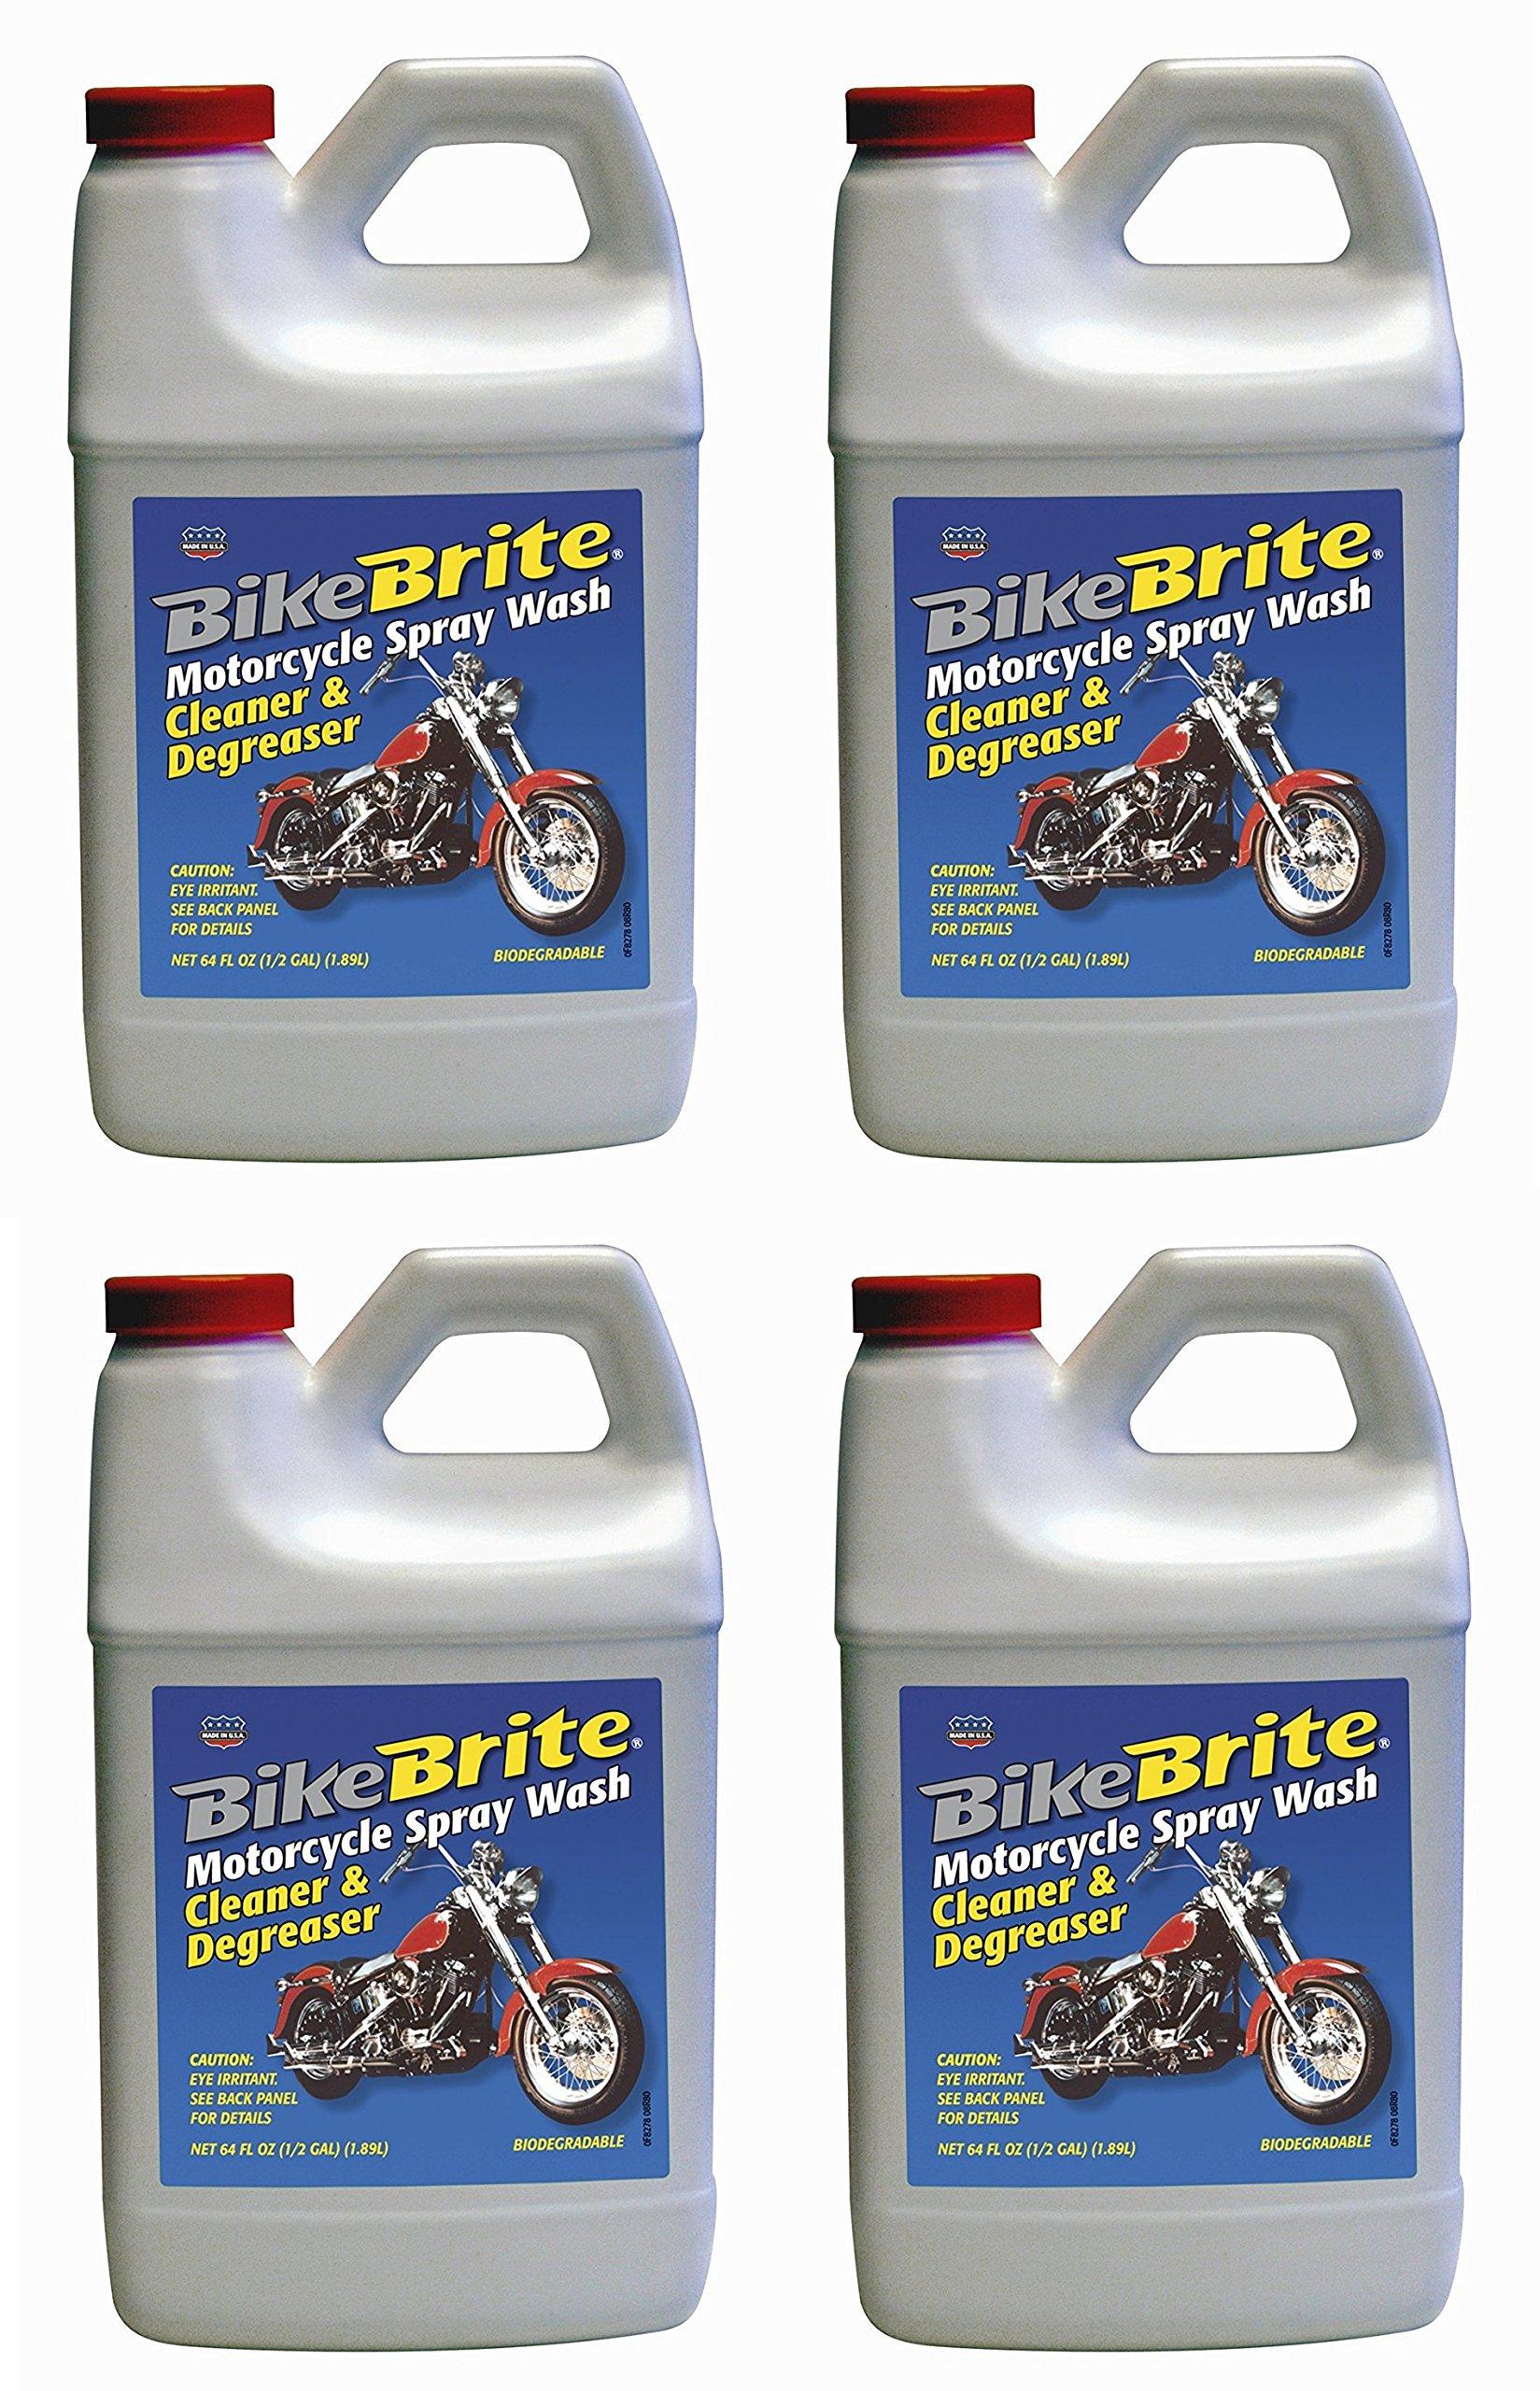 Bike Brite MC44R Motorcycle Spray Wash Cleaner and Degreaser - 64 fl. oz. (4)